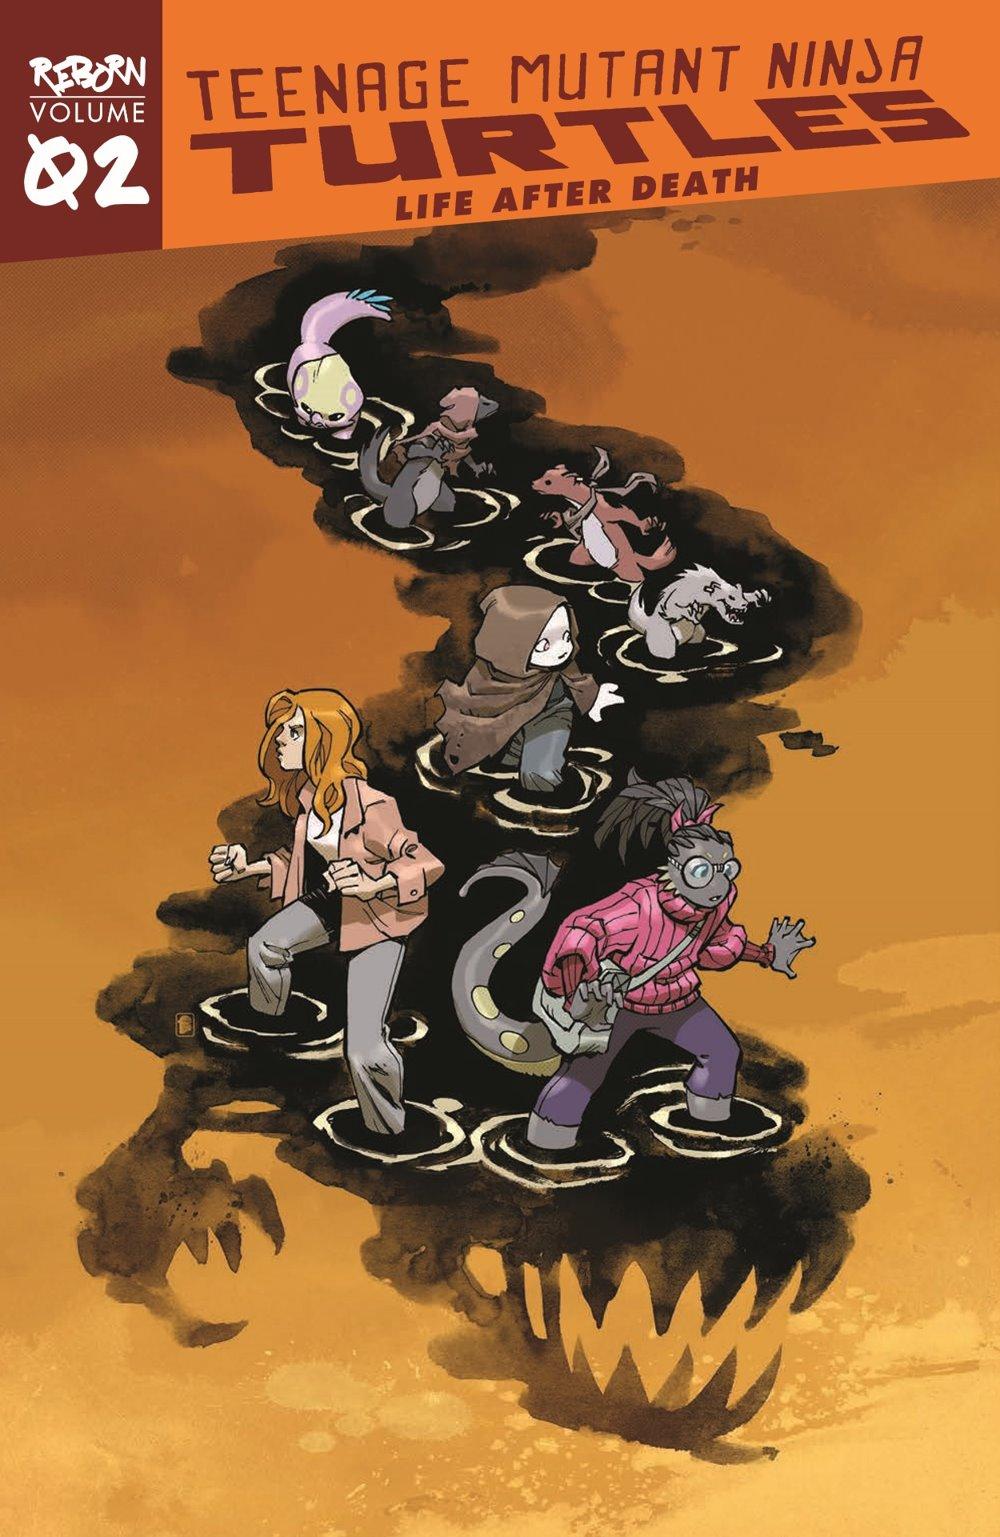 TMNT-Reborn02_pr-1 ComicList Previews: TEENAGE MUTANT NINJA TURTLES REBORN VOLUME 2 LIFE AFTER DEATH TP